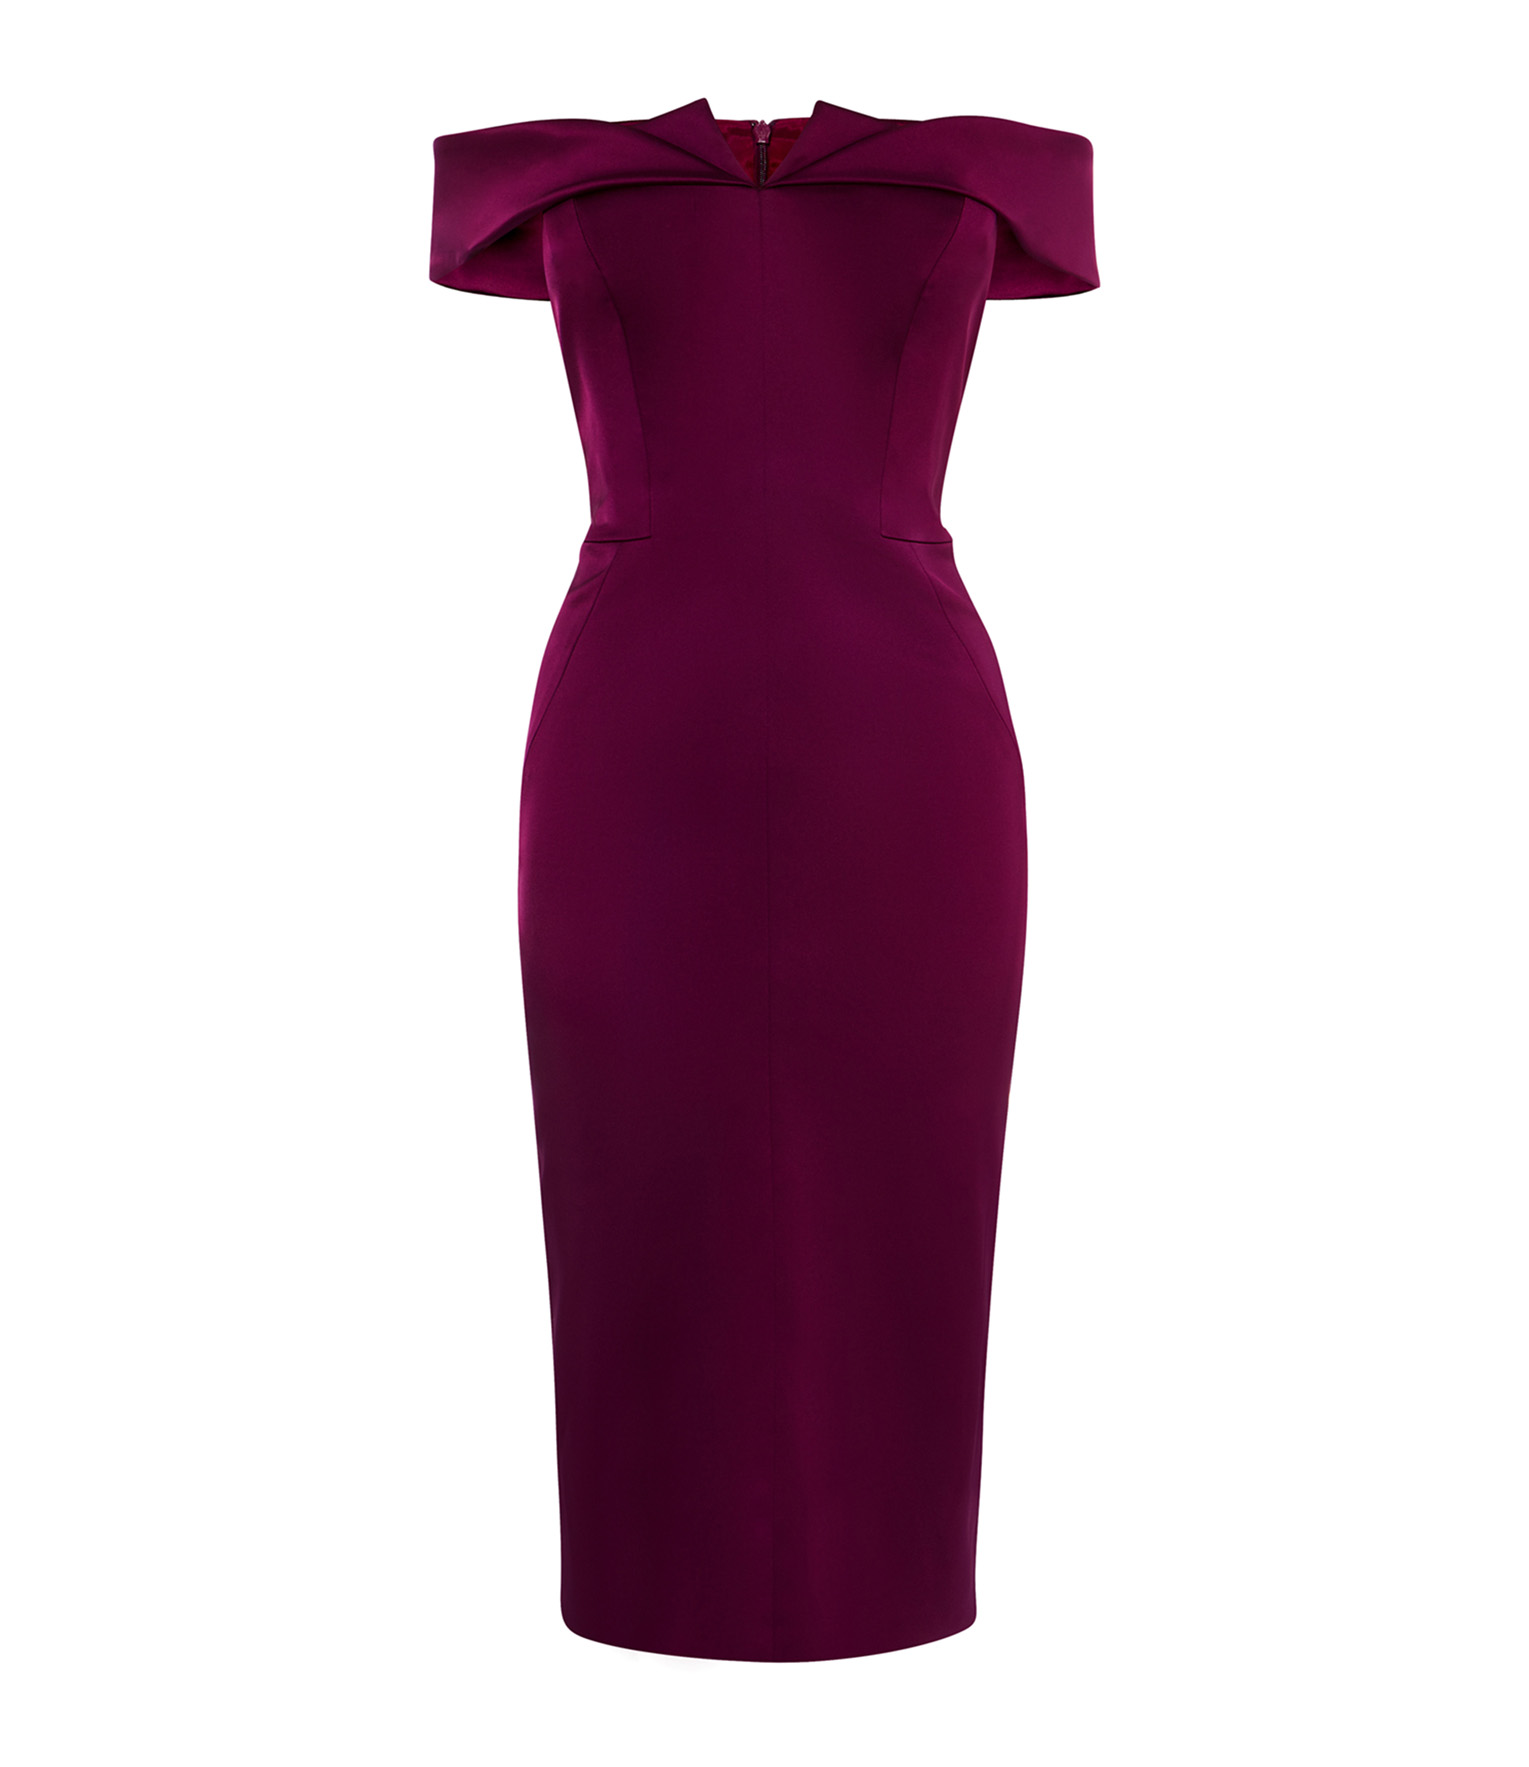 Satin Bodycon Dress | Endource